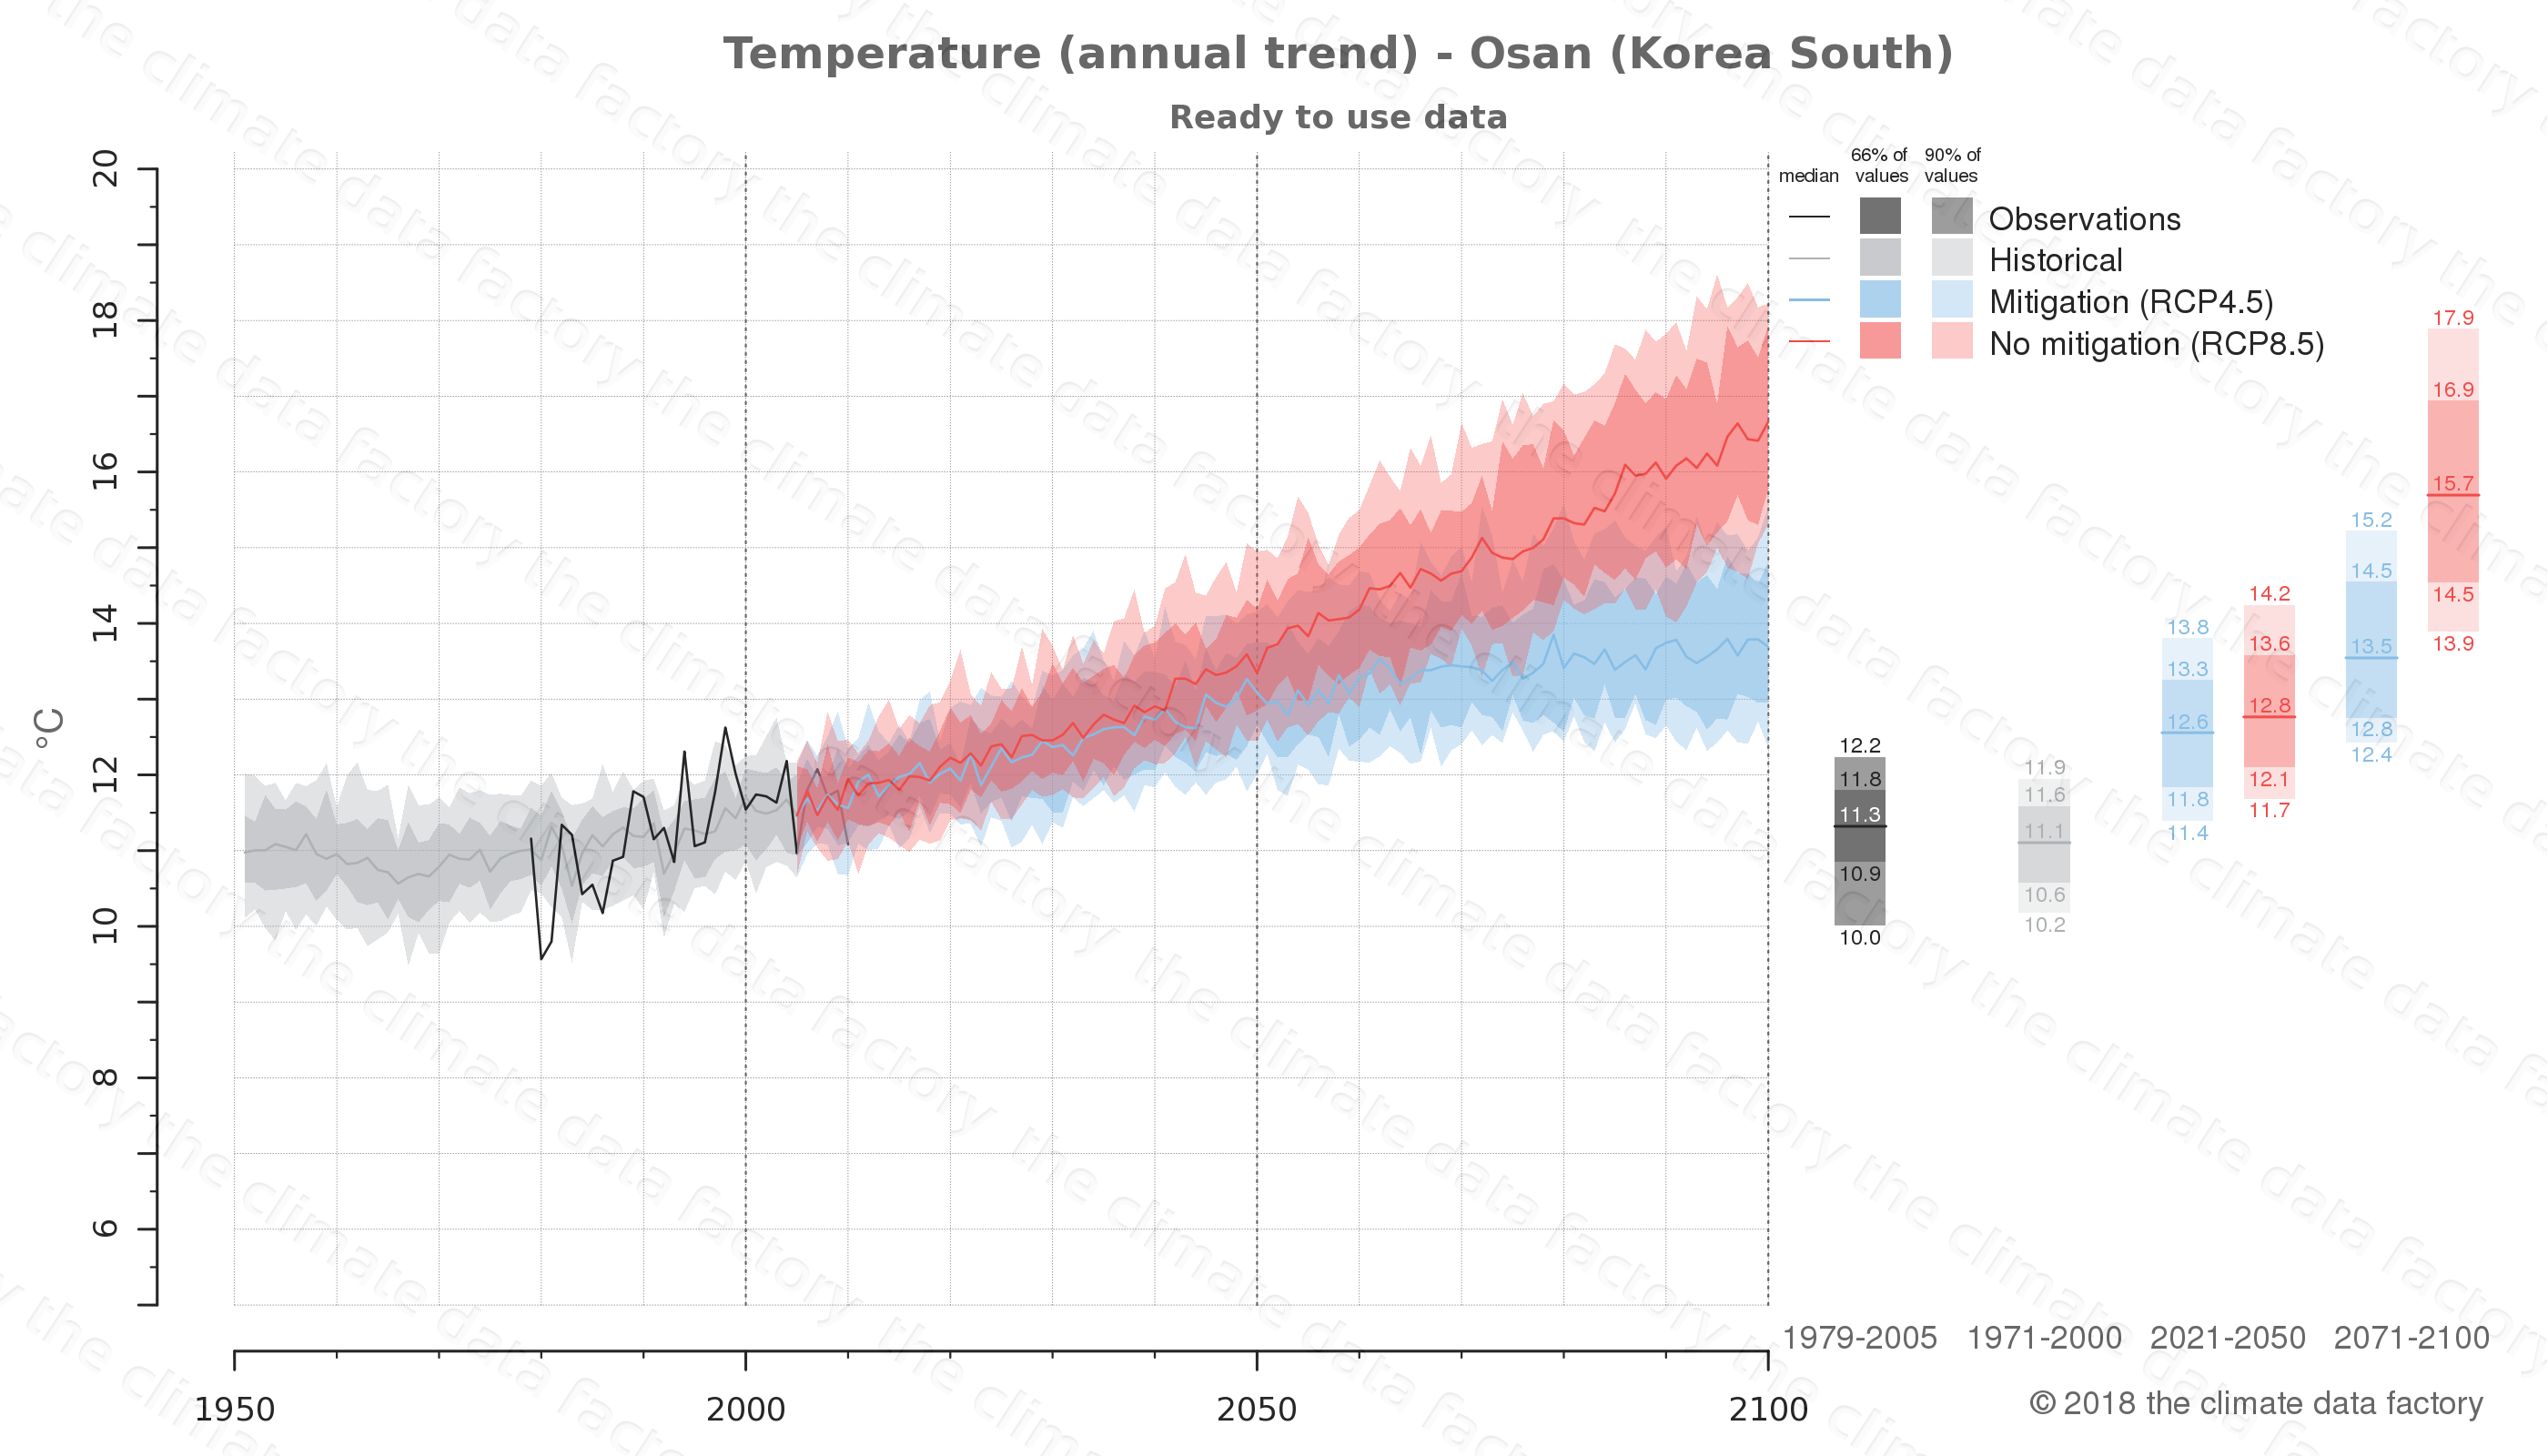 climate change data policy adaptation climate graph city data temperature osan south korea